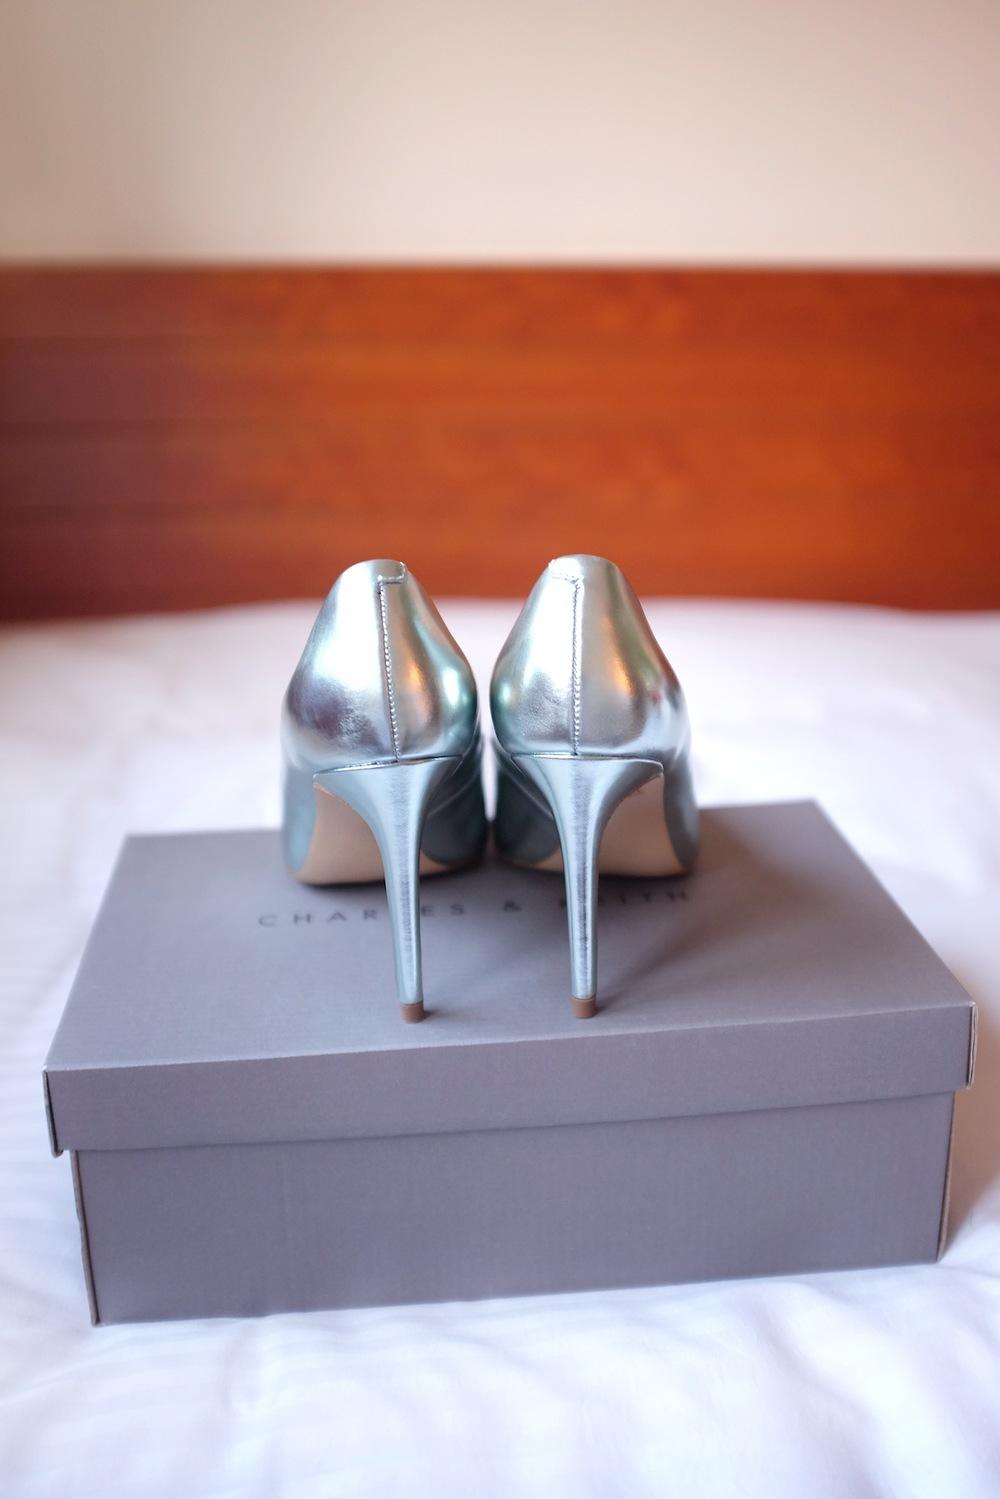 YSL, Saint Laurent, Zara, leather, shoes, heels, clutch, Charles & Keith, shoe fashion, pumps, metallic heels, suede, leather suede, baby blue, powder blue, cute, style, fashion, haul, purchase, second hand, vintage, nezuki